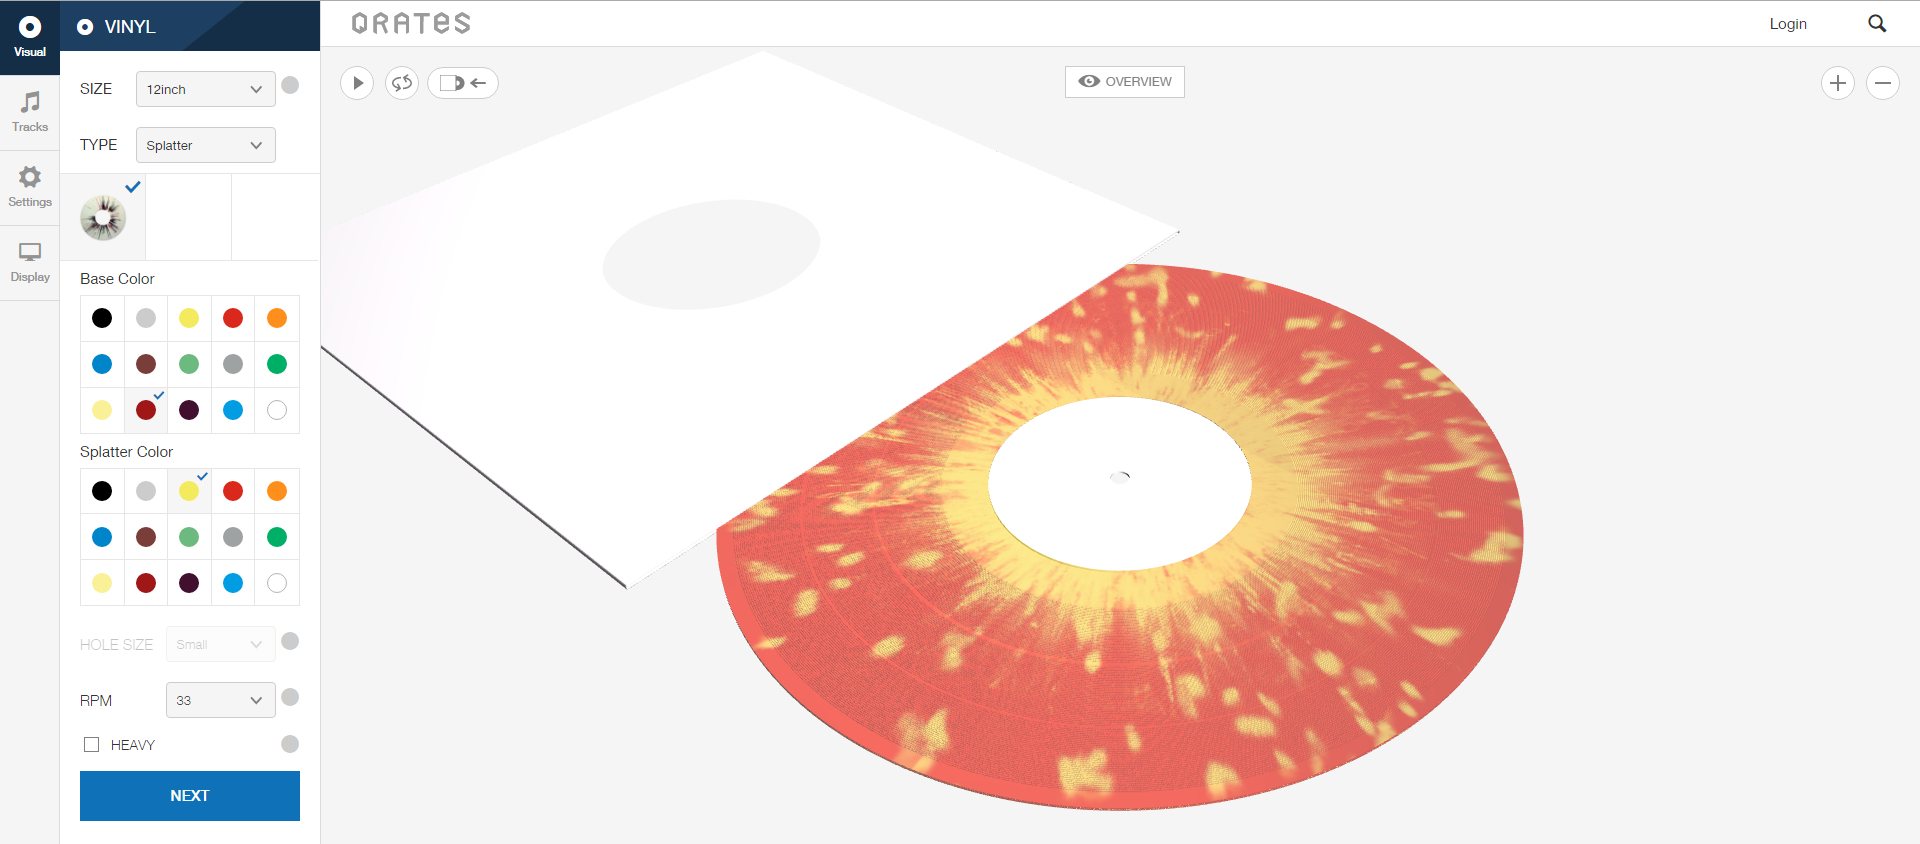 custom vinyl creation Qrates indie artists